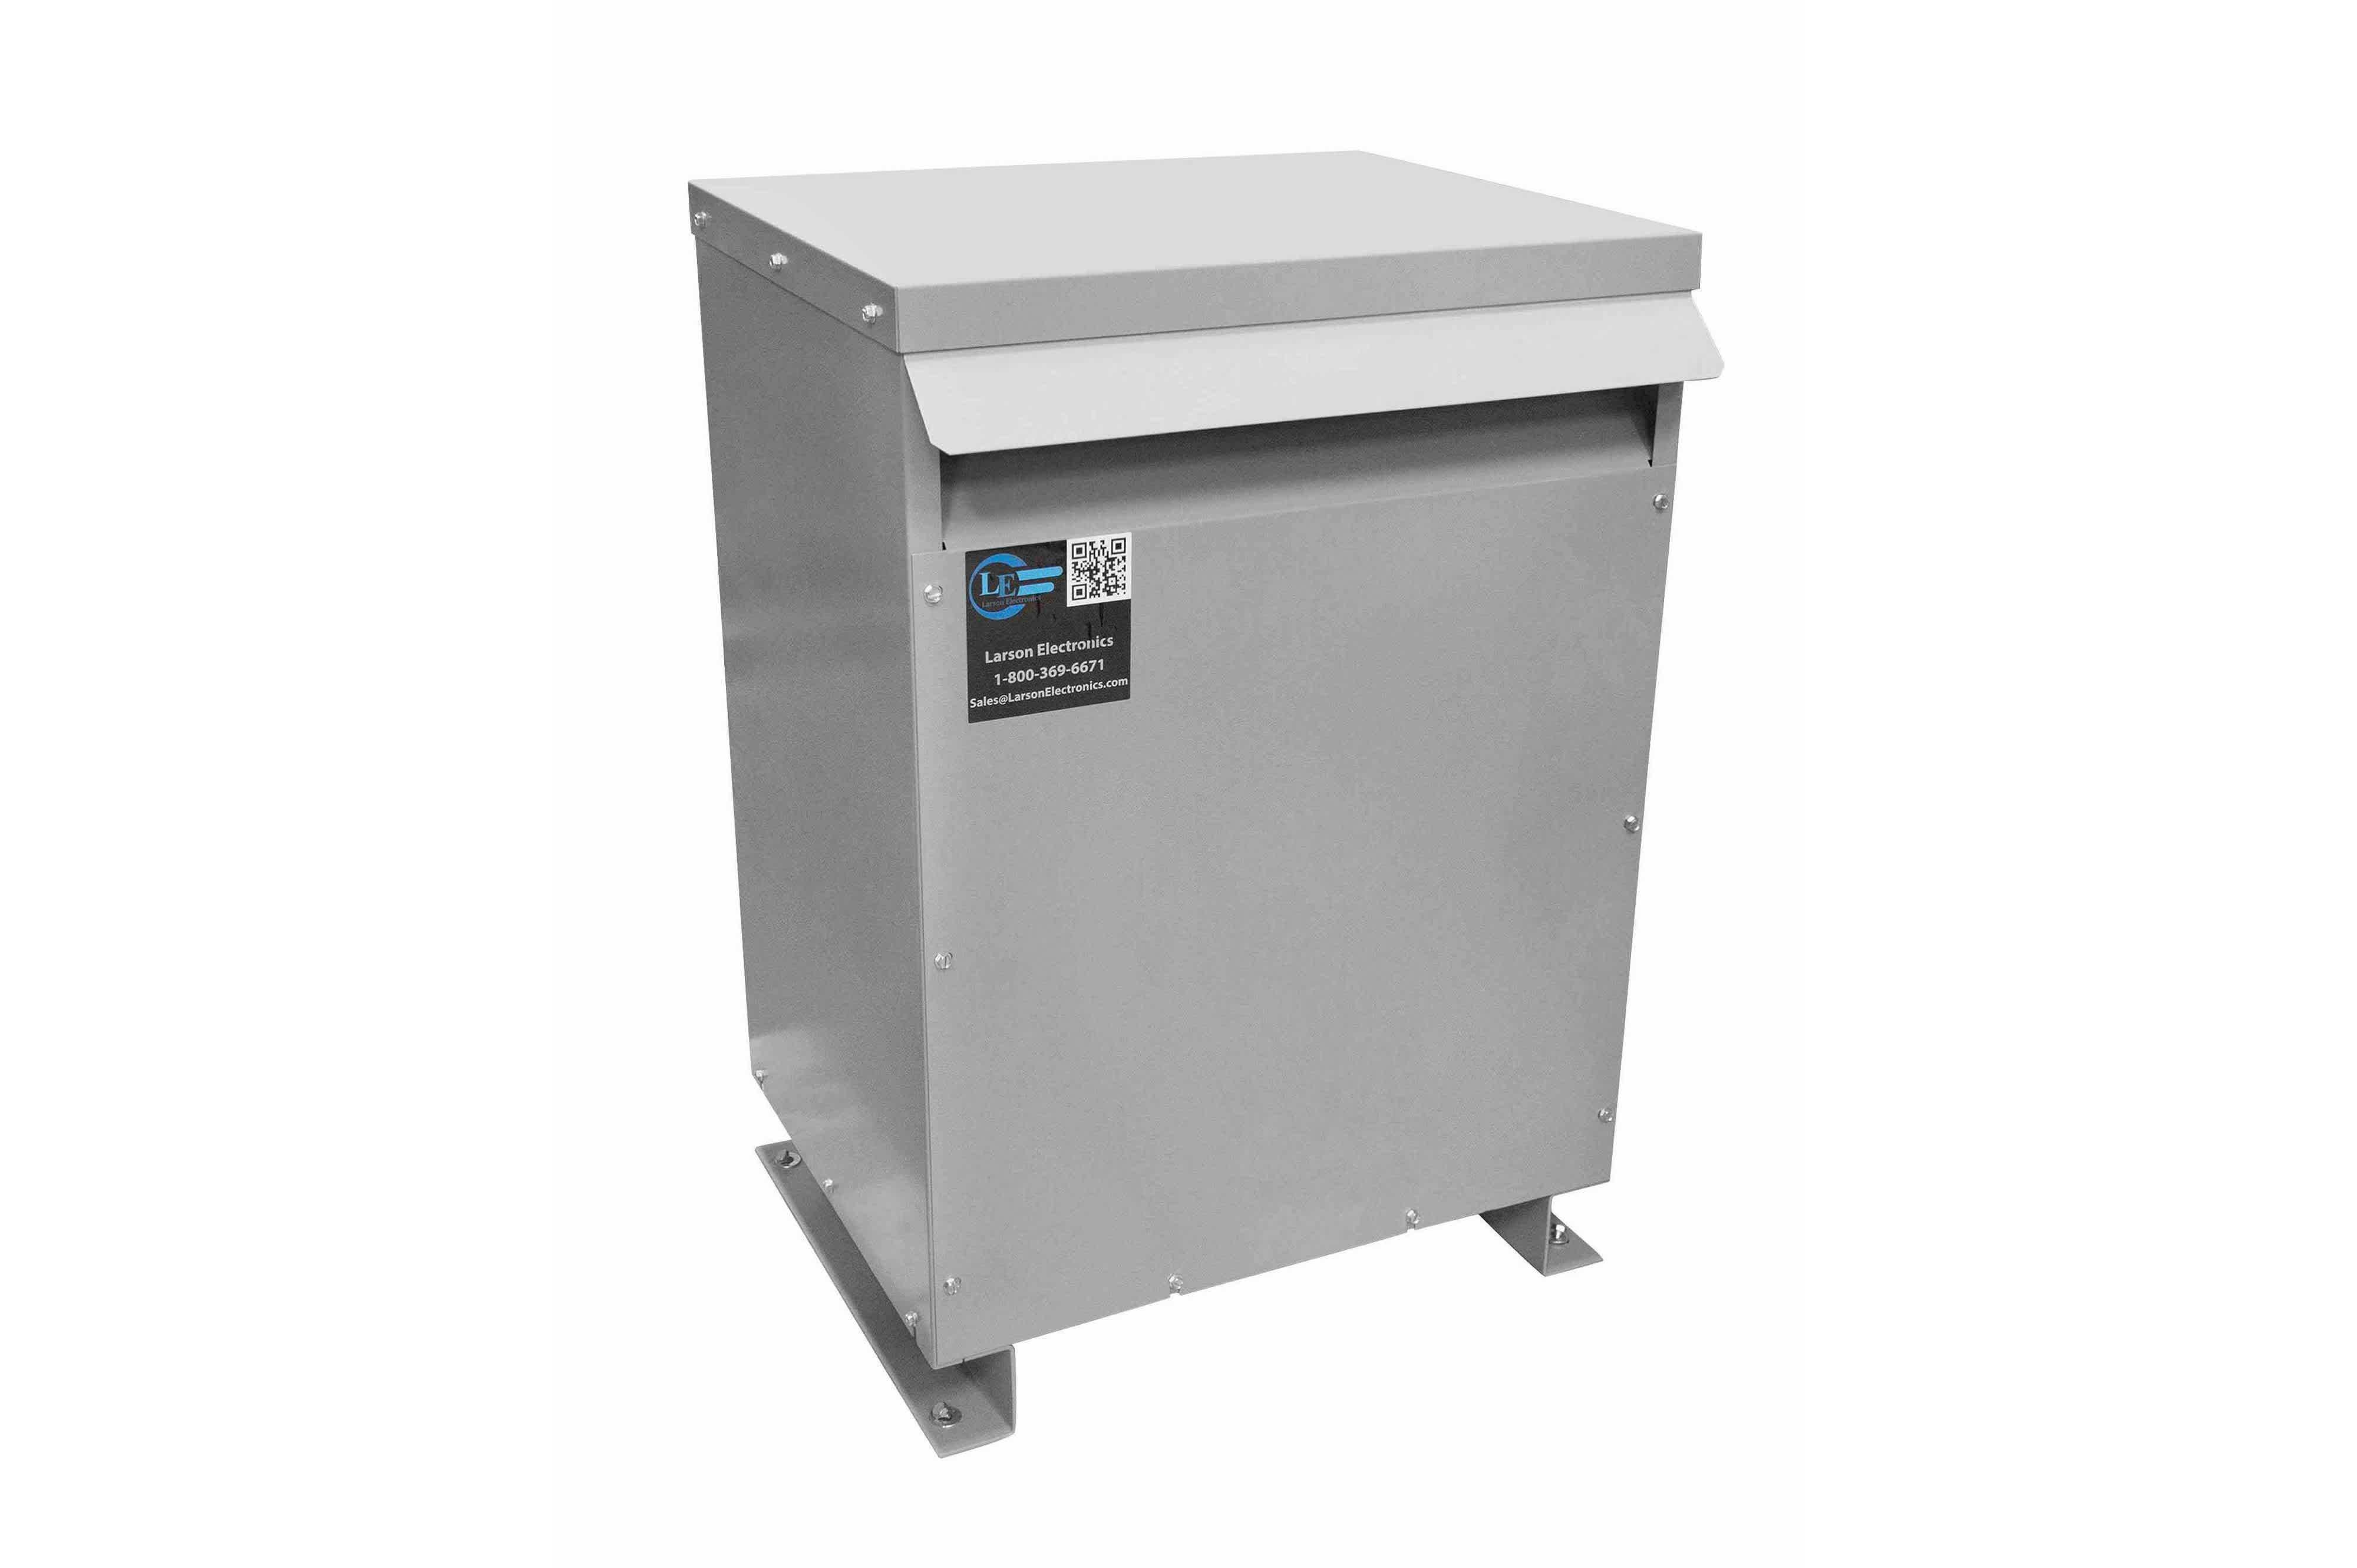 237.5 kVA 3PH Isolation Transformer, 240V Wye Primary, 208Y/120 Wye-N Secondary, N3R, Ventilated, 60 Hz